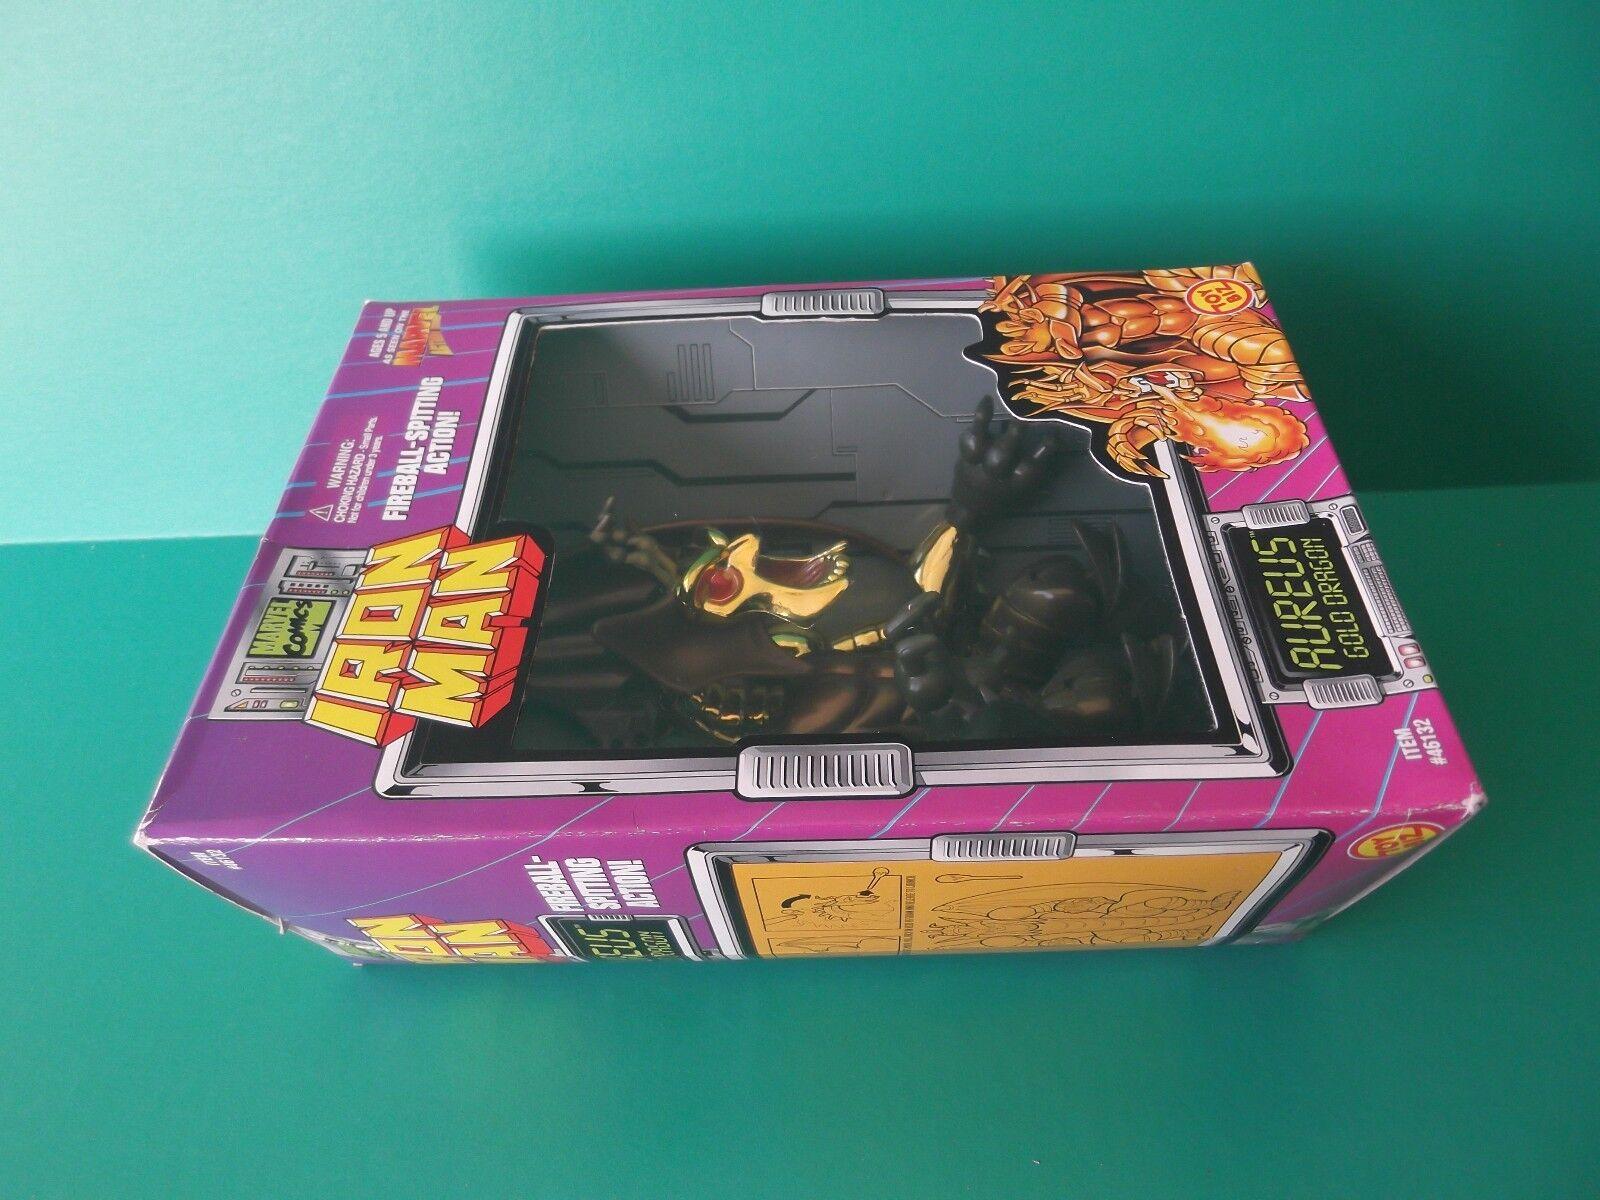 AUREUS gold DRAGON IRON IRON IRON MAN MARVEL COMICS TOY BIZ 7.5 IN ACTION FIGURE 1995 82dd96